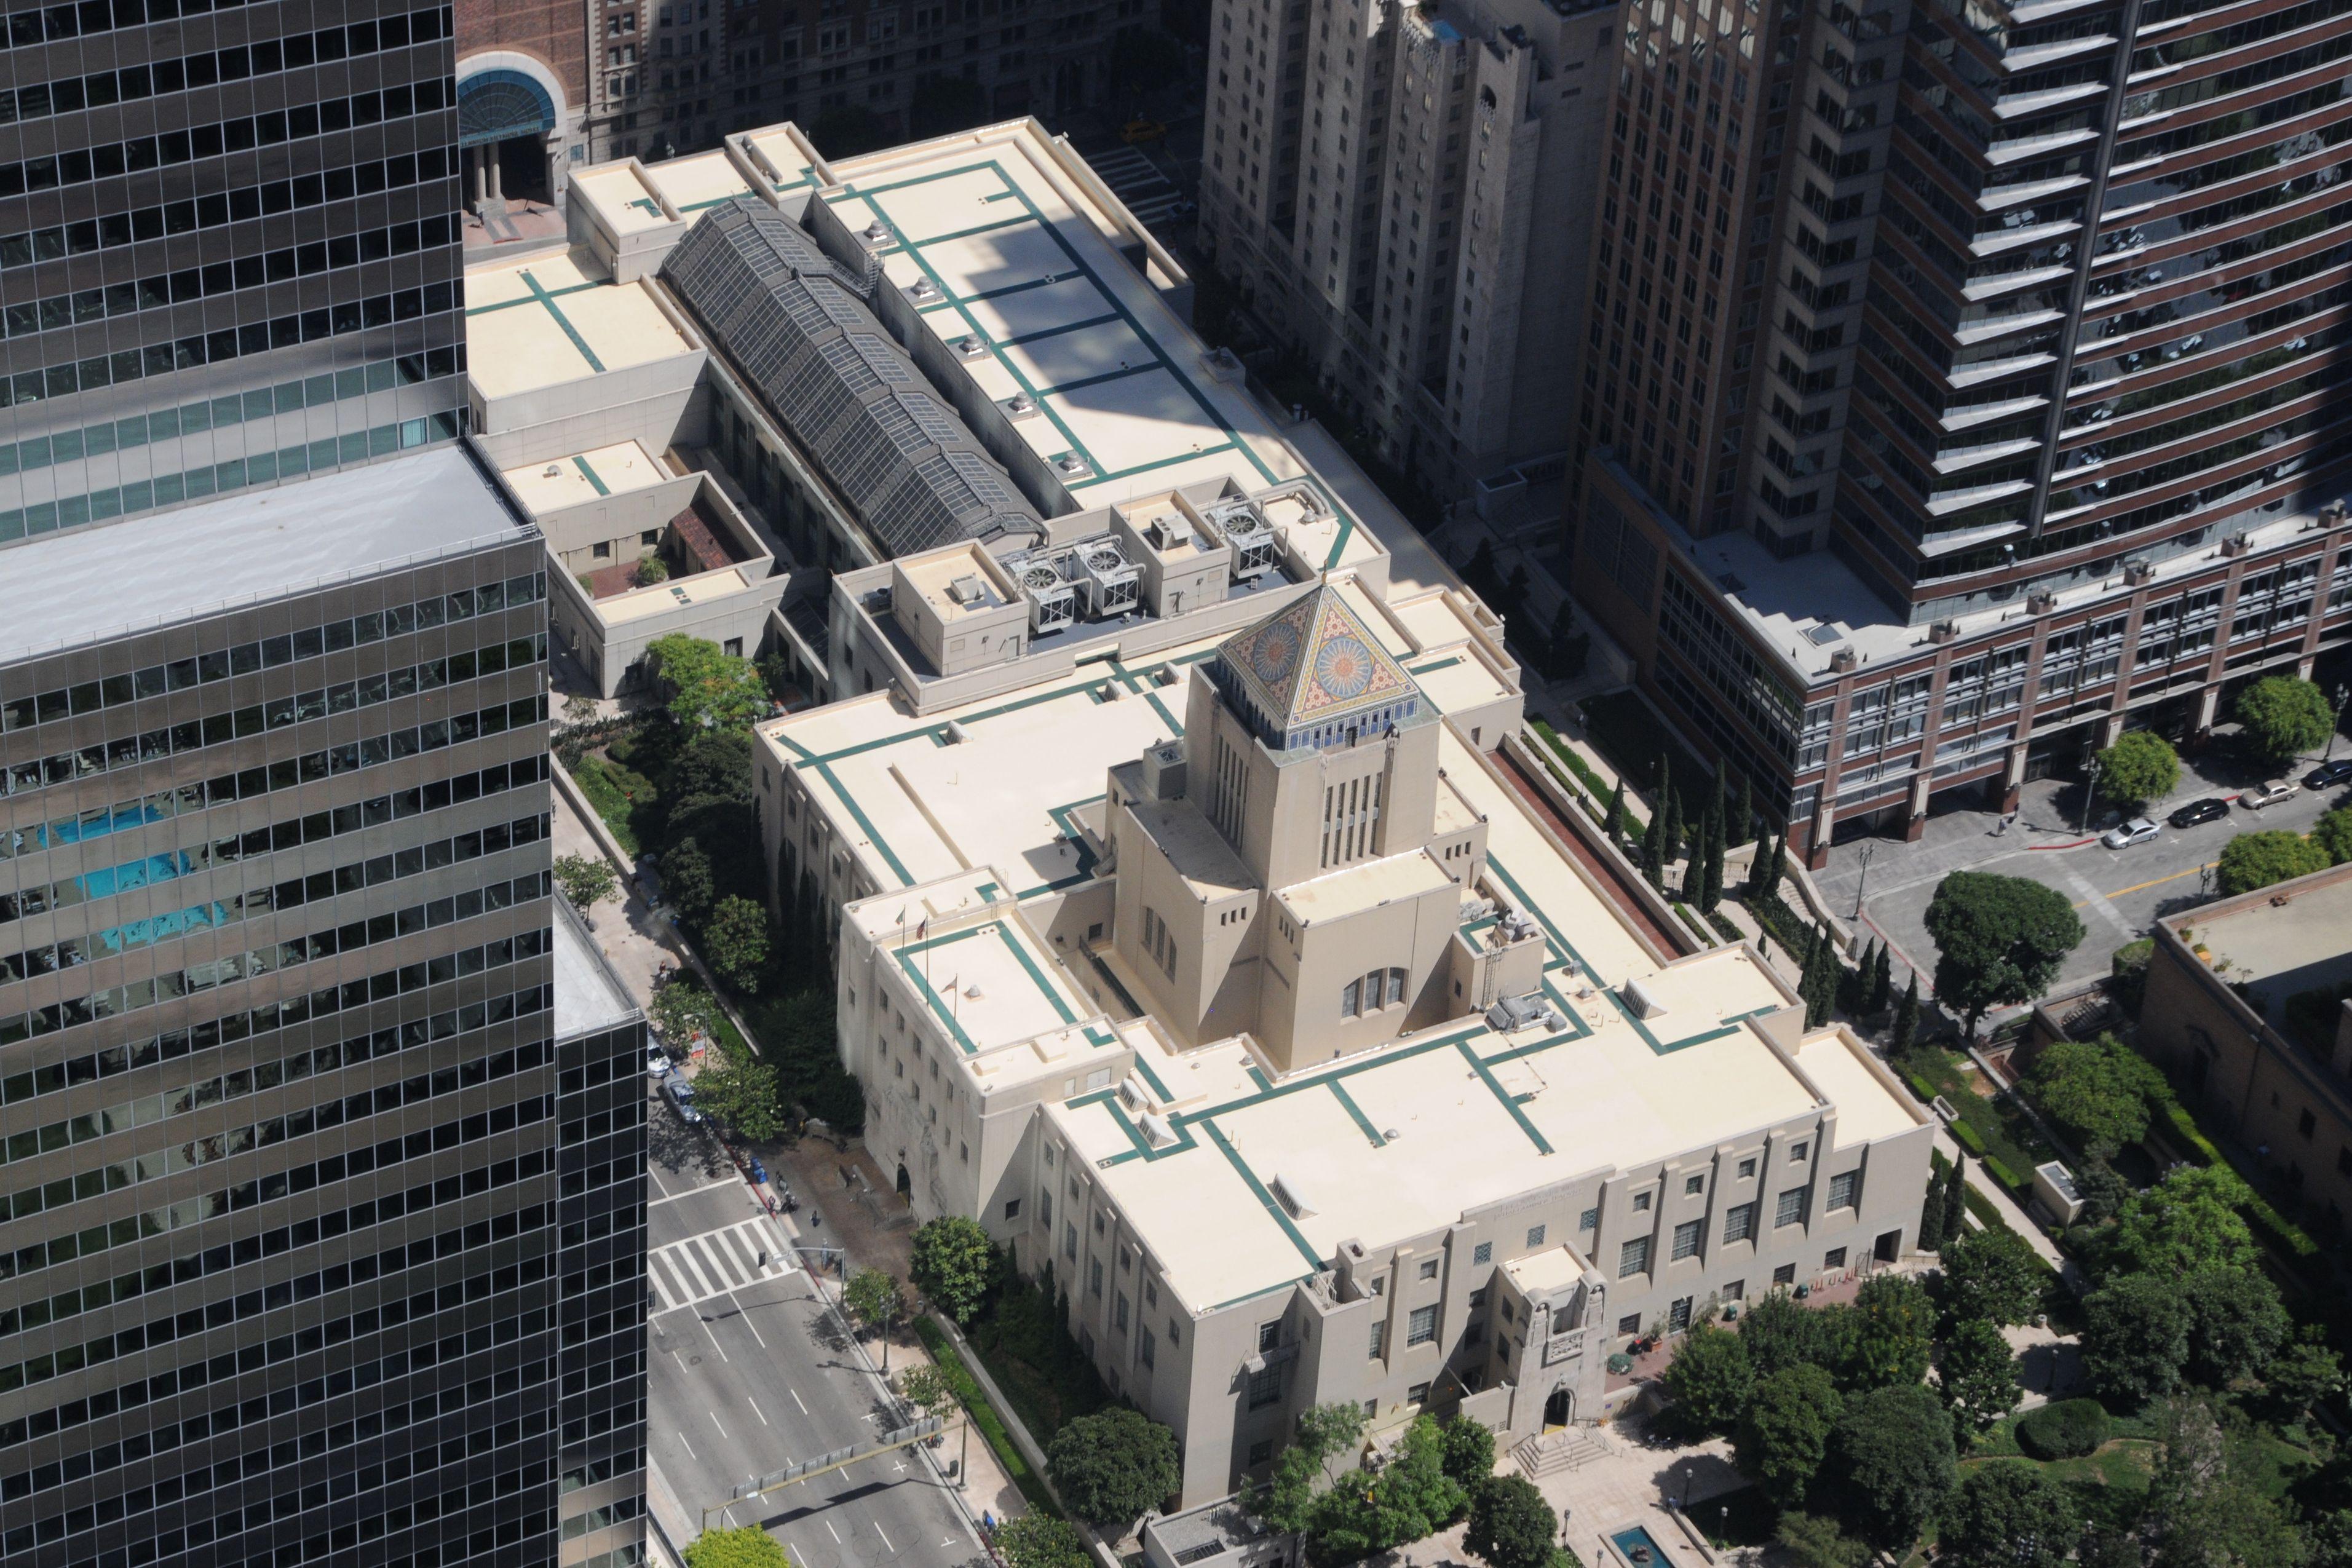 Riordan Library Roof